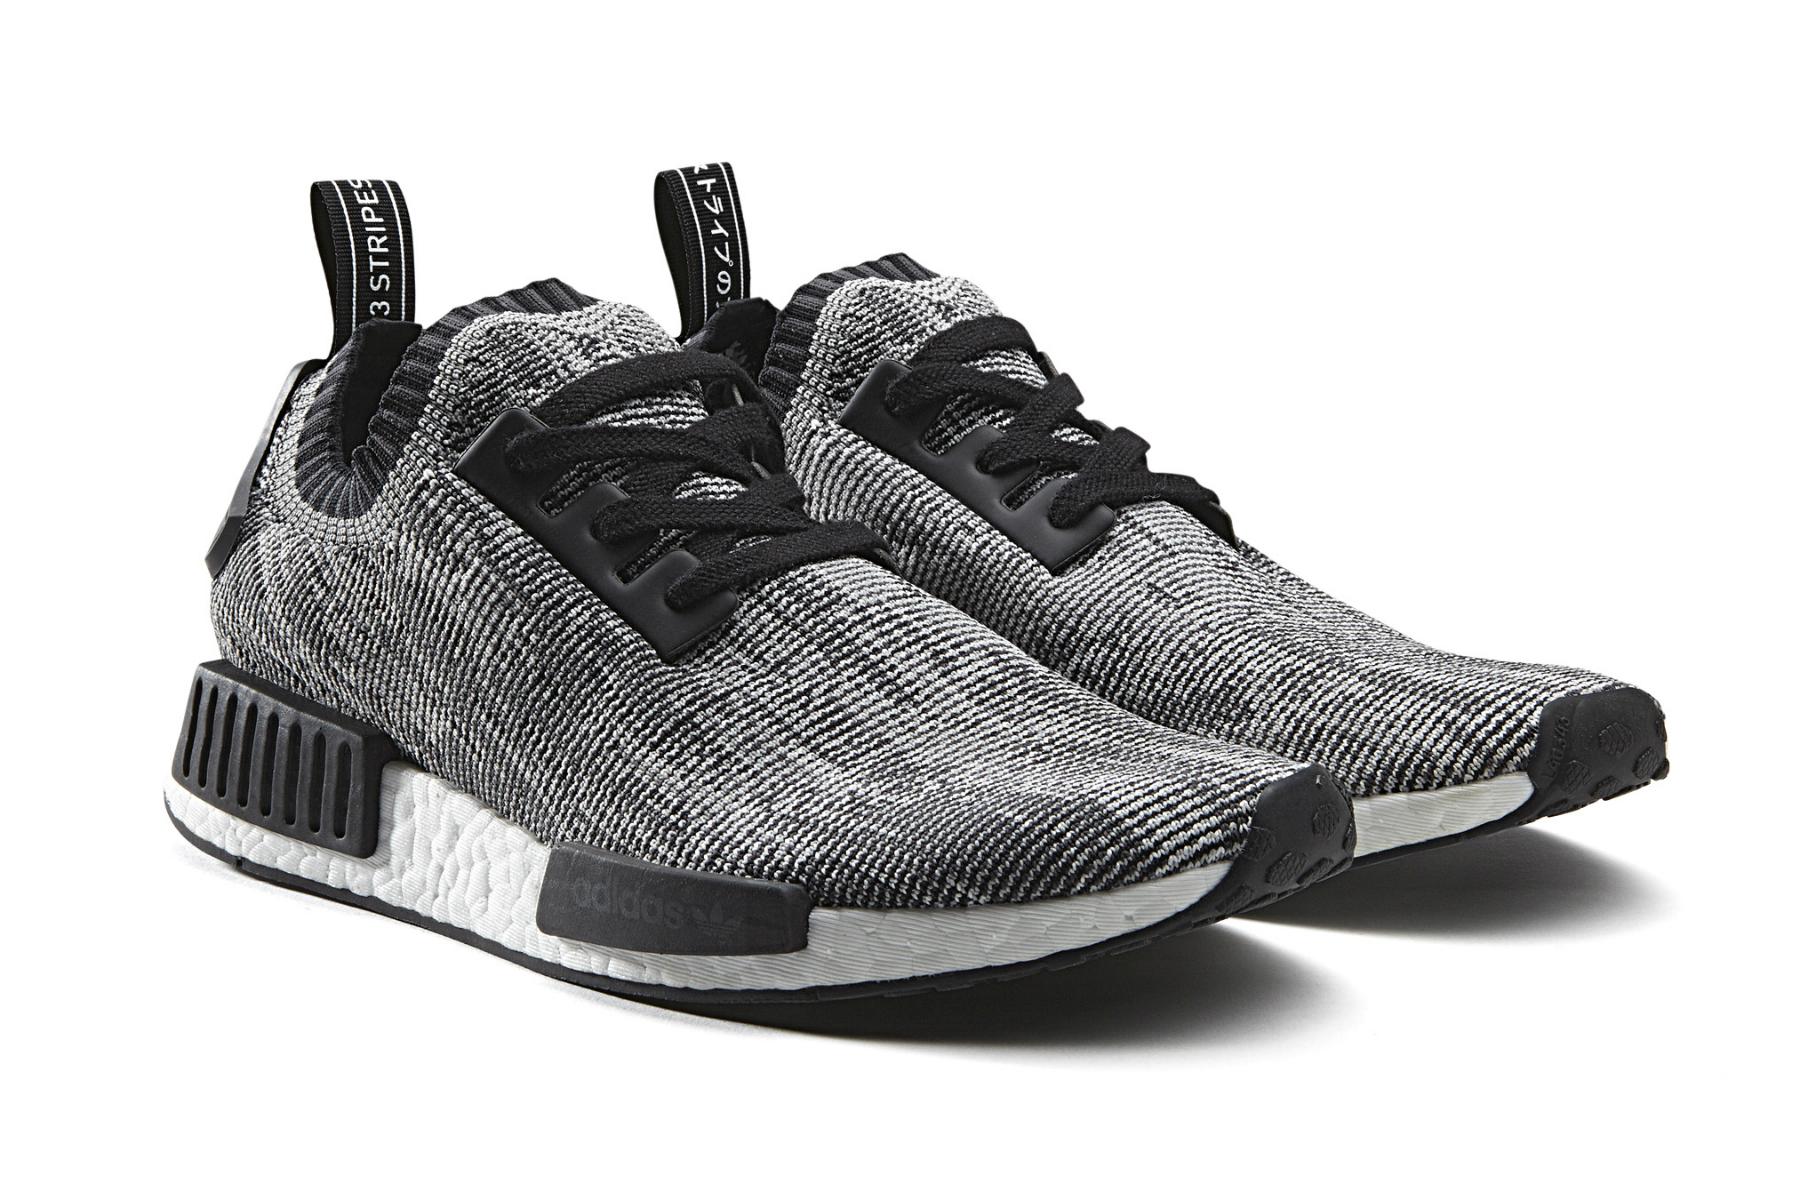 304de1cbb adidas kanye west yeezy 3 adidas nmd blackout